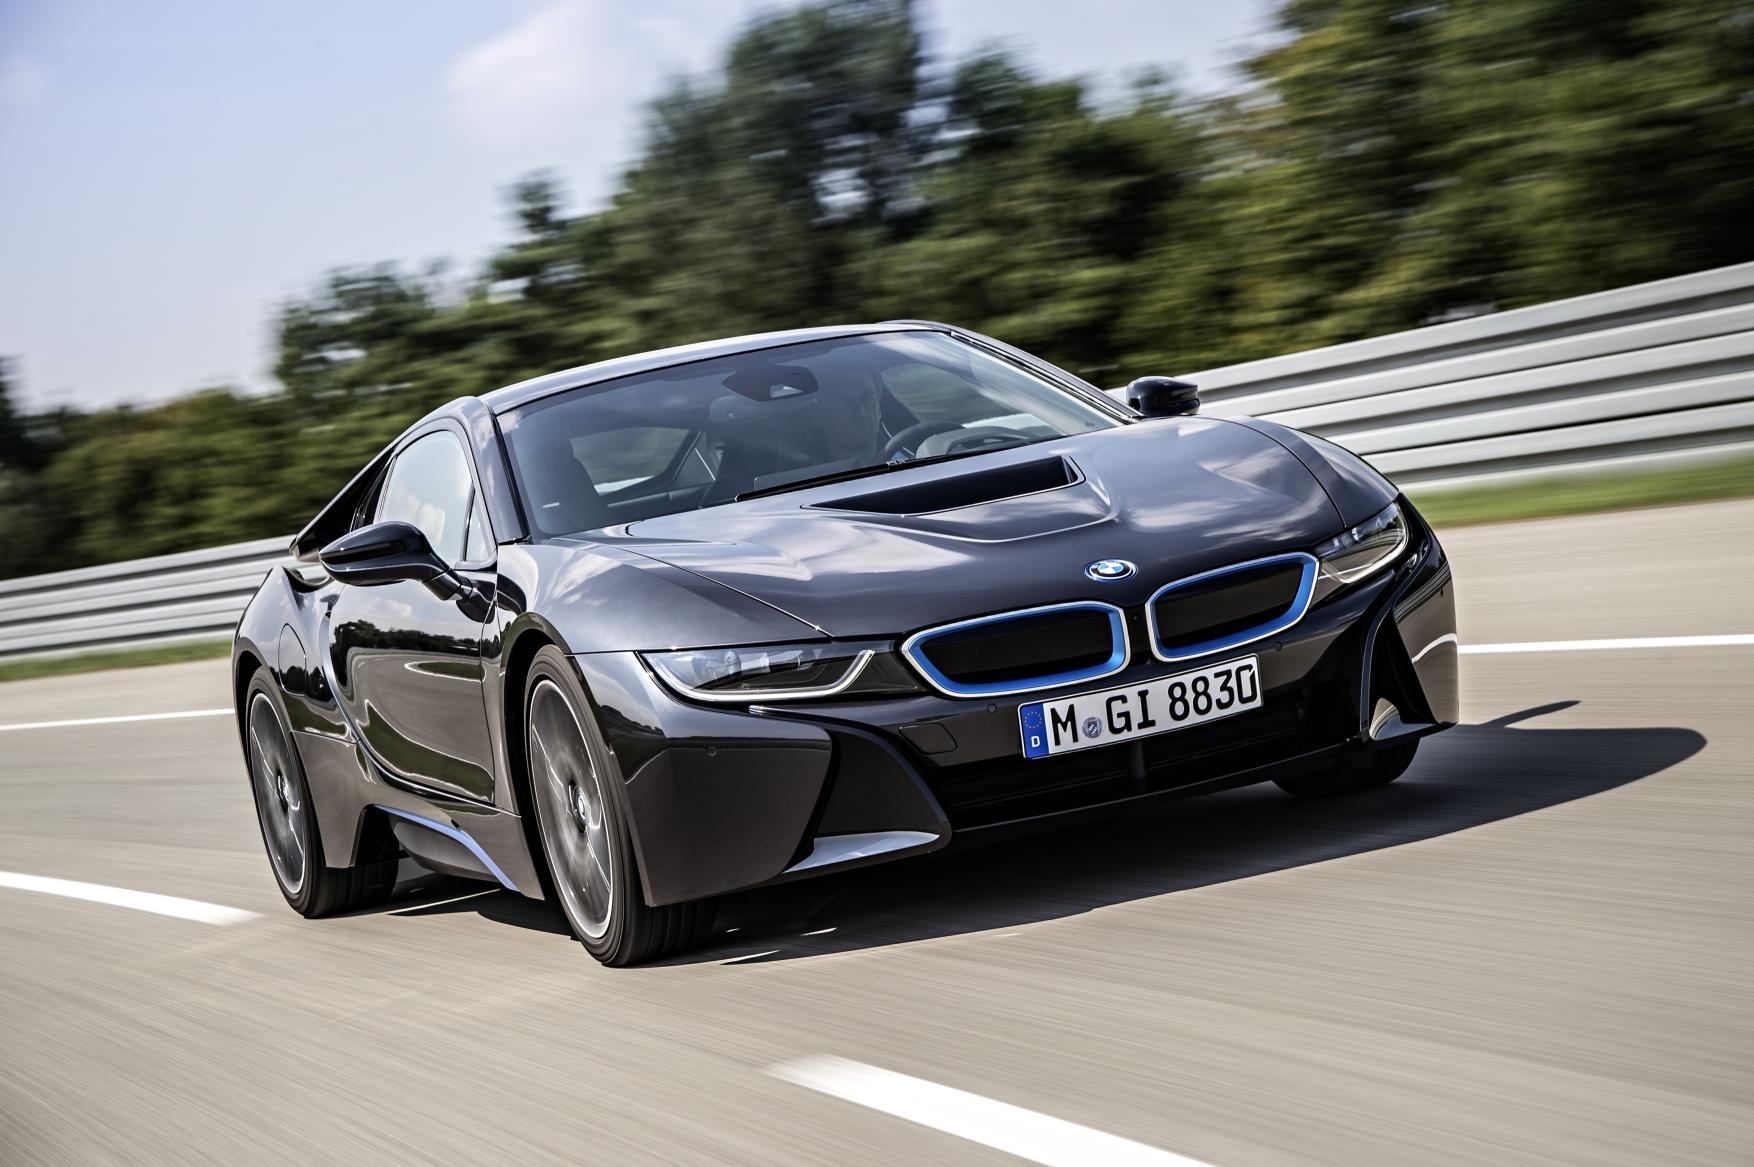 BMW I Review Autoevolution - 2015 bmw i8 coupe price